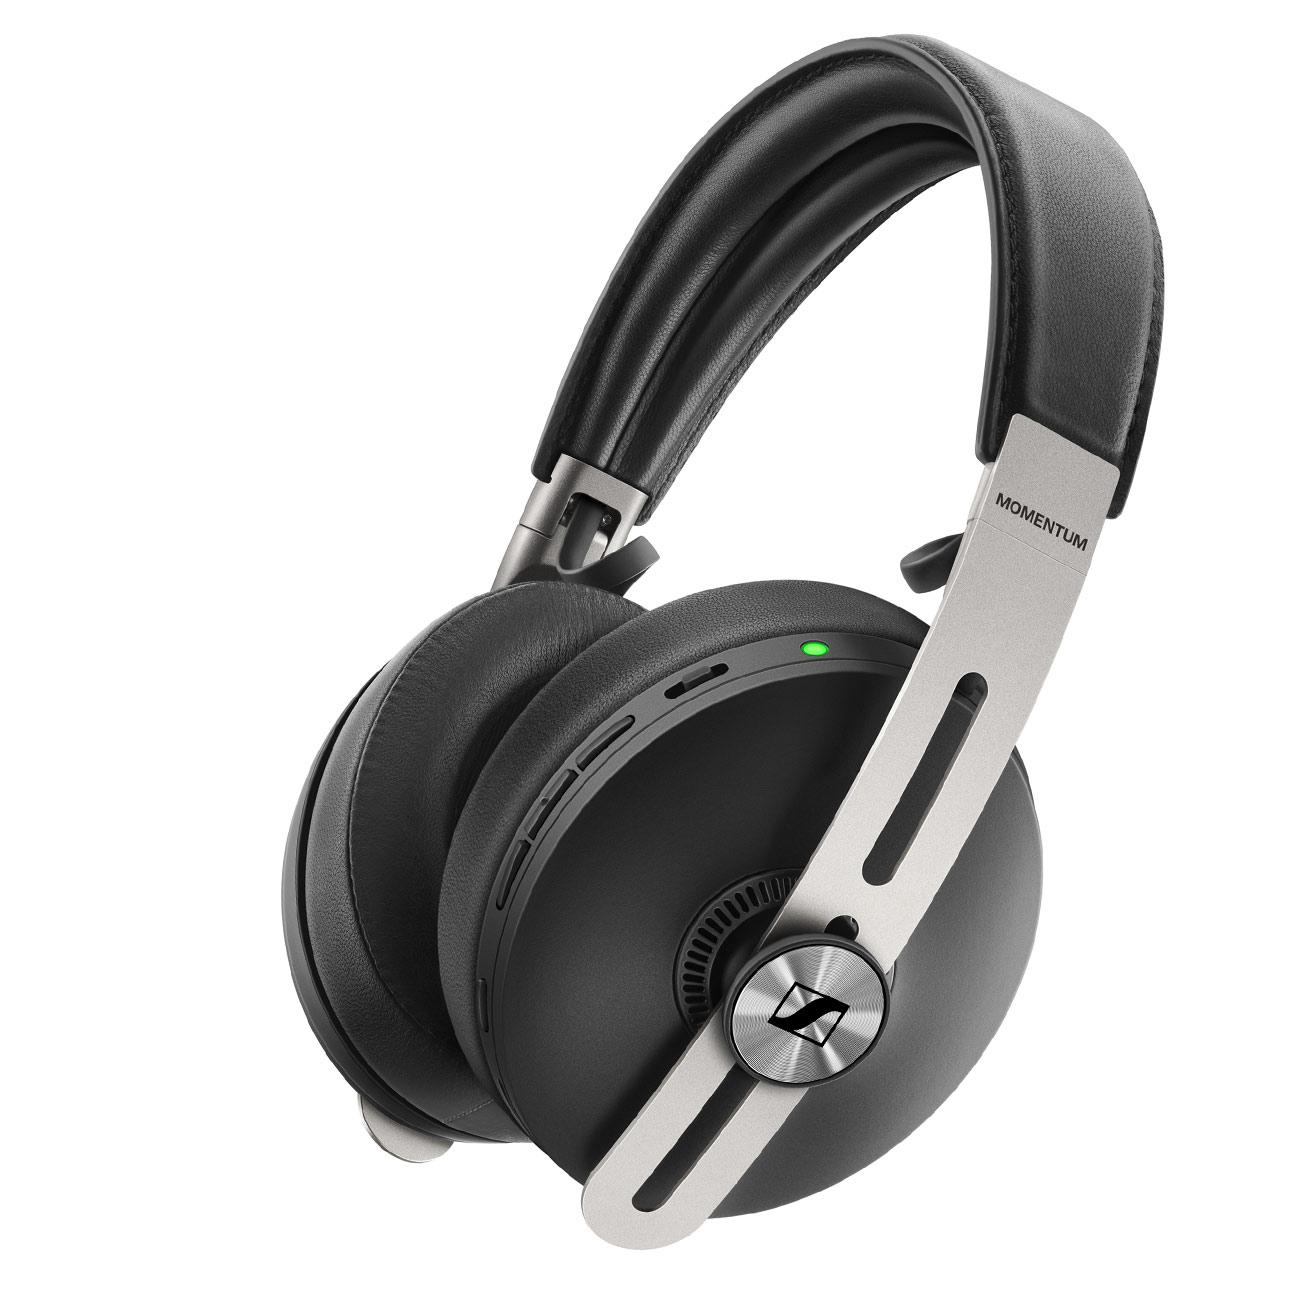 Refurbished Sennheiser momentum 3 wireless headphones 2 year warranty, over ear - B Grade £169 Sennheiser Shop